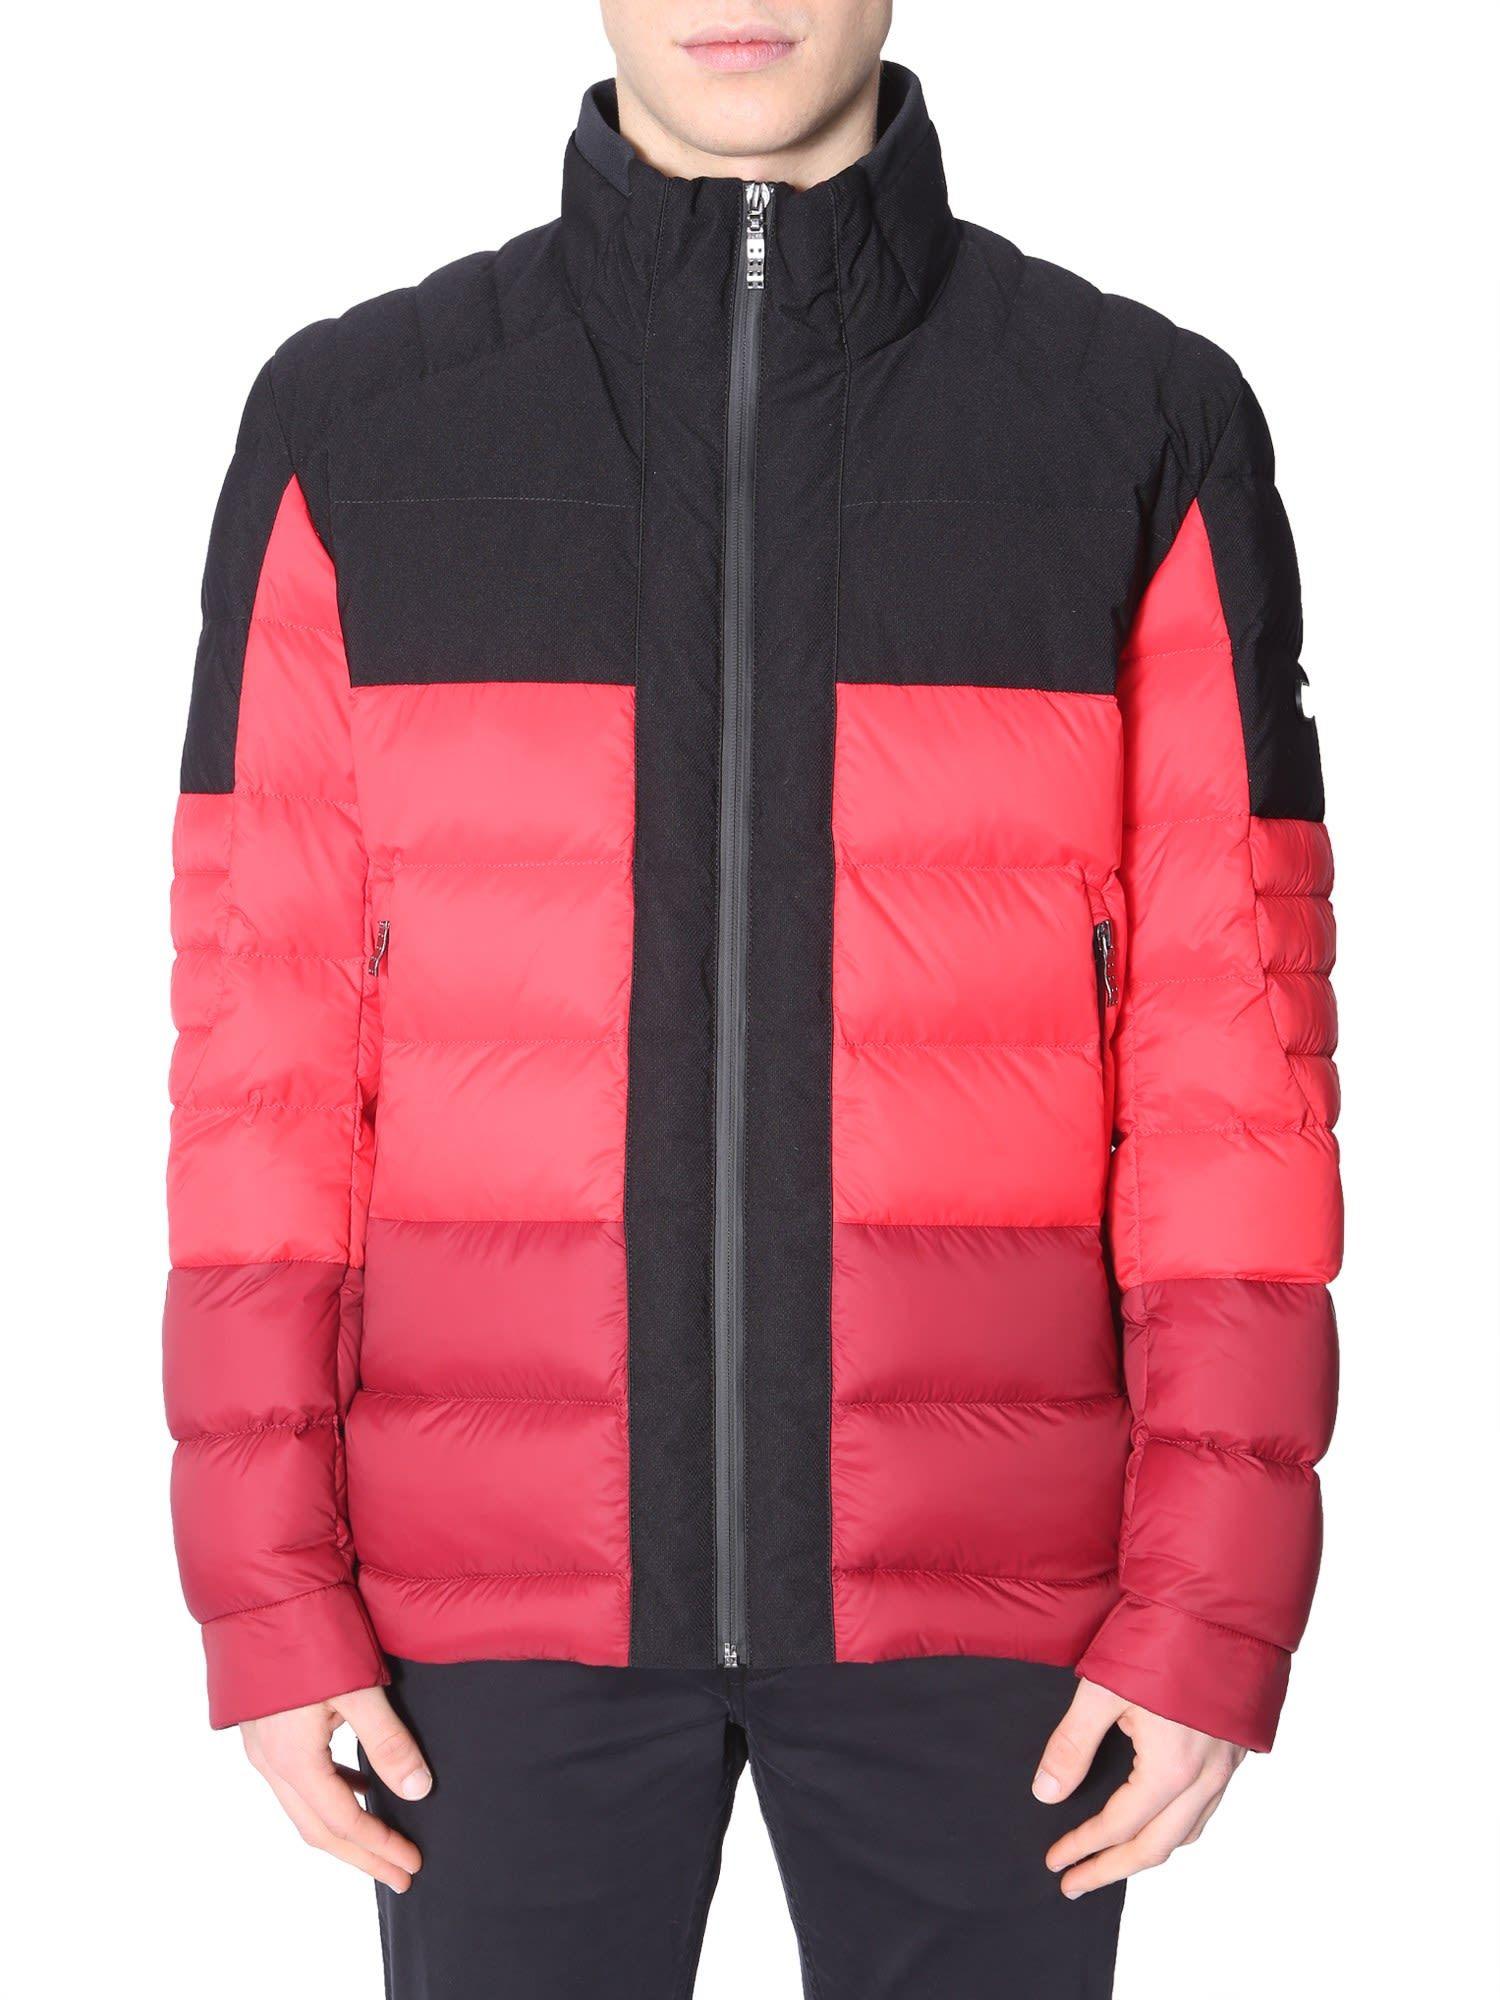 Hugo Boss Jonkins 4 Down Jacket Hugoboss Cloth [ 2000 x 1500 Pixel ]